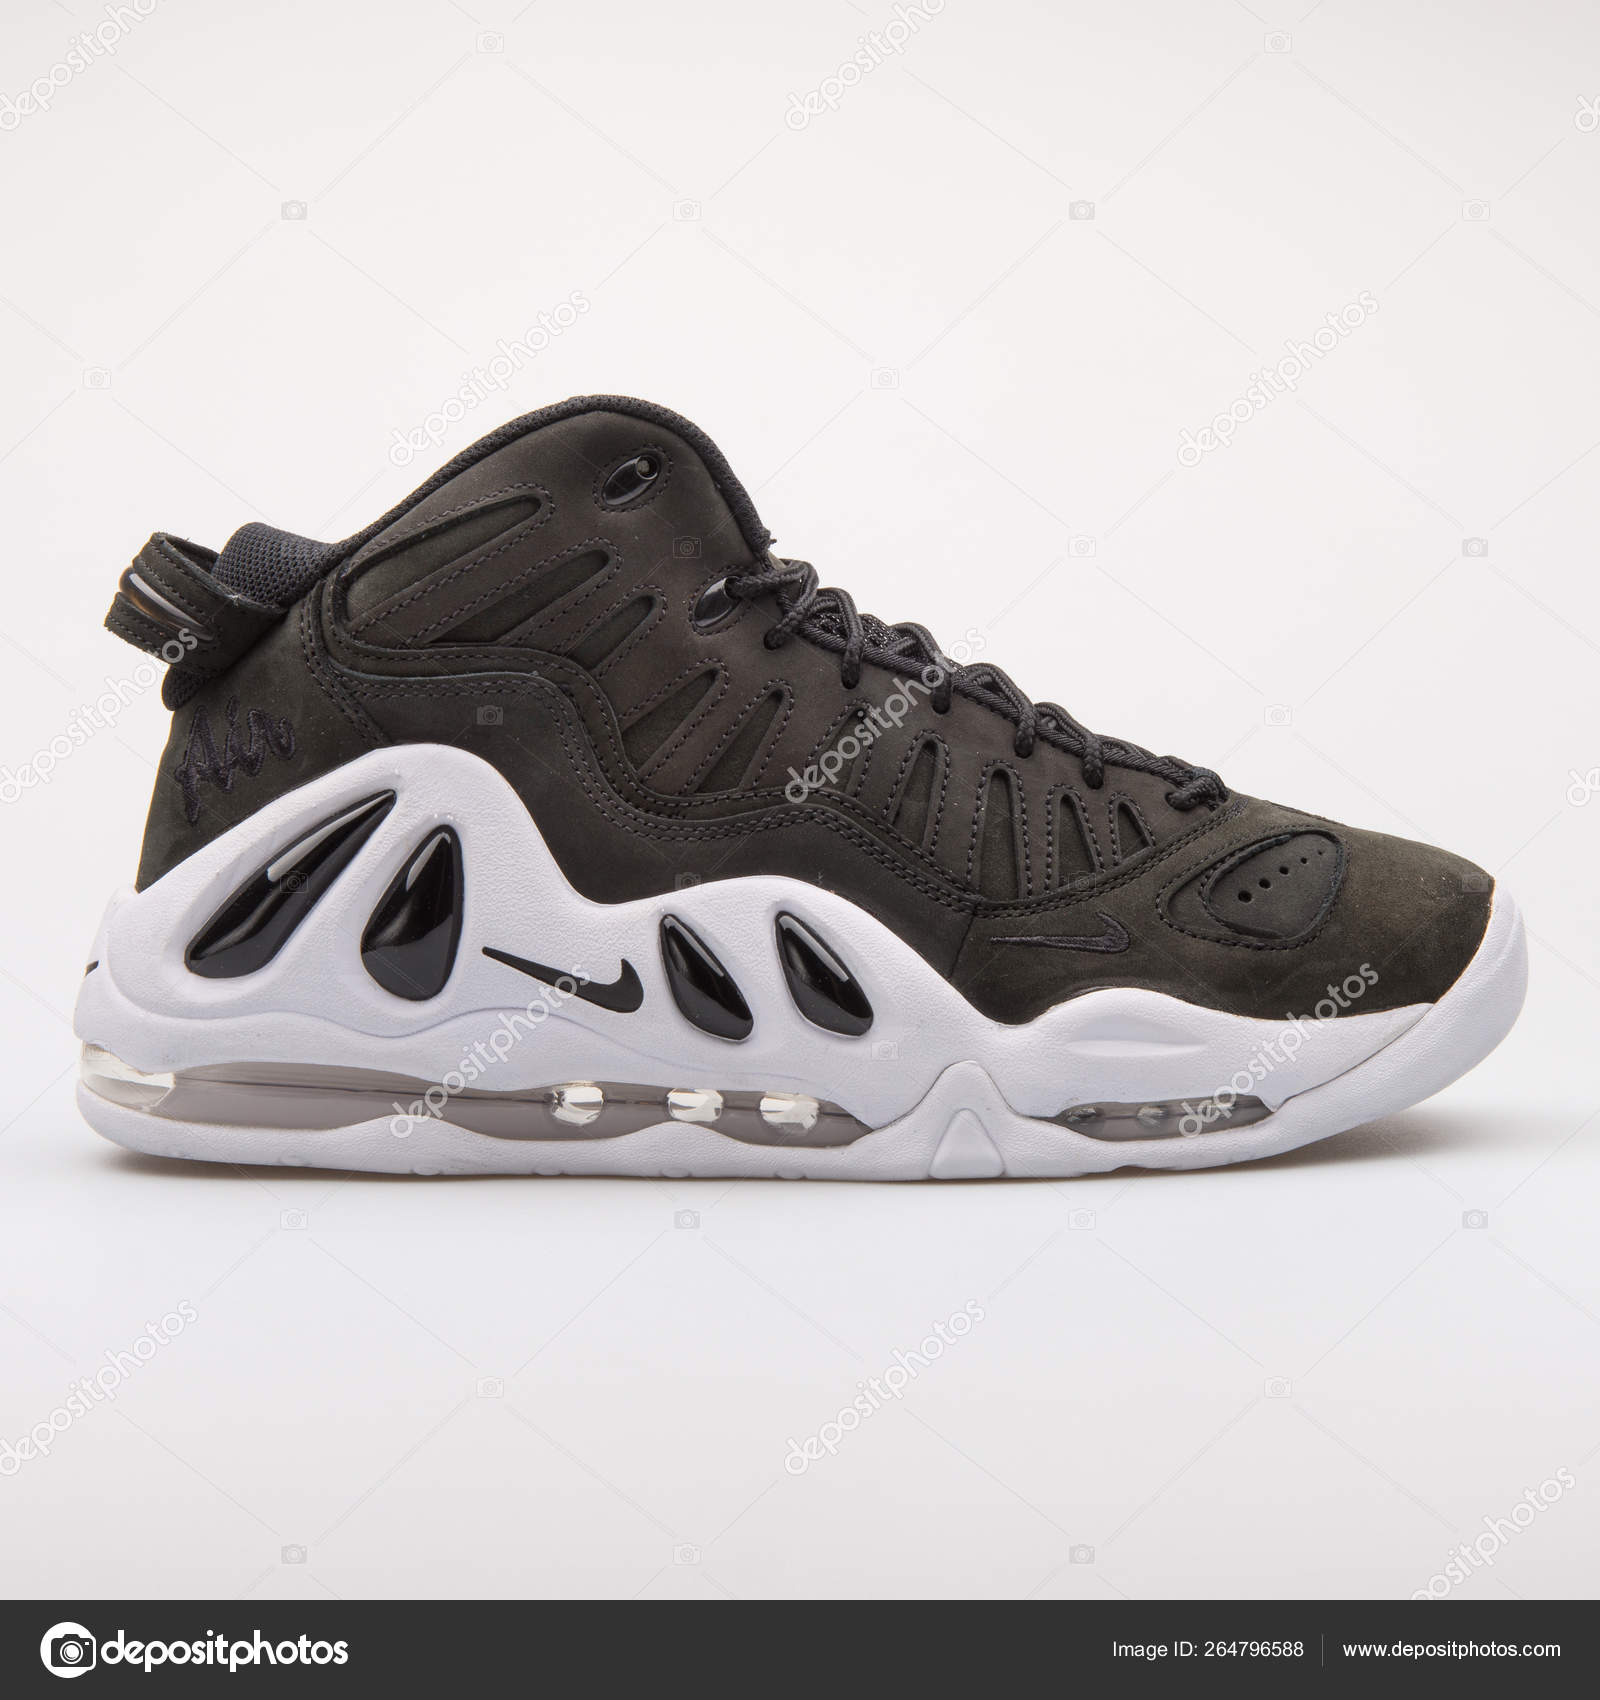 Nike Air Max Uptempo 97 black sneaker